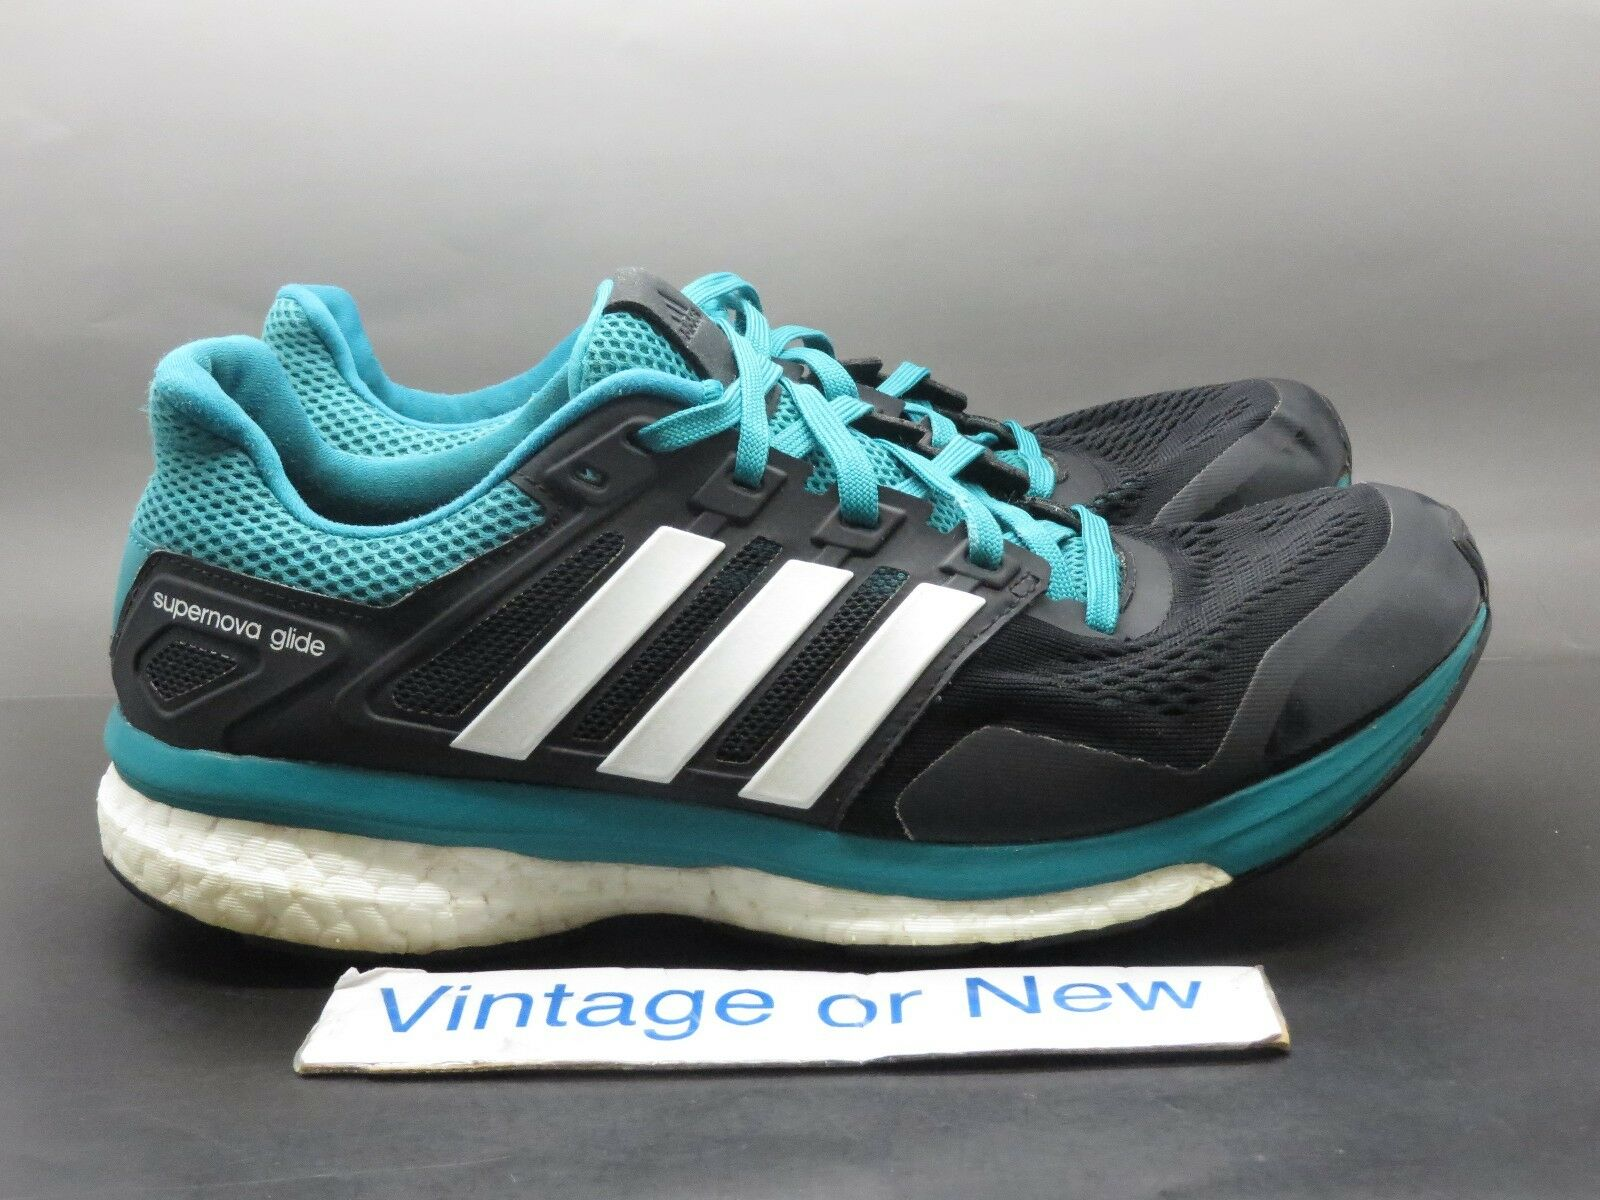 Men's Adidas Supernova Glide 8 Core Black White Green Running Shoes AF6547 sz 9